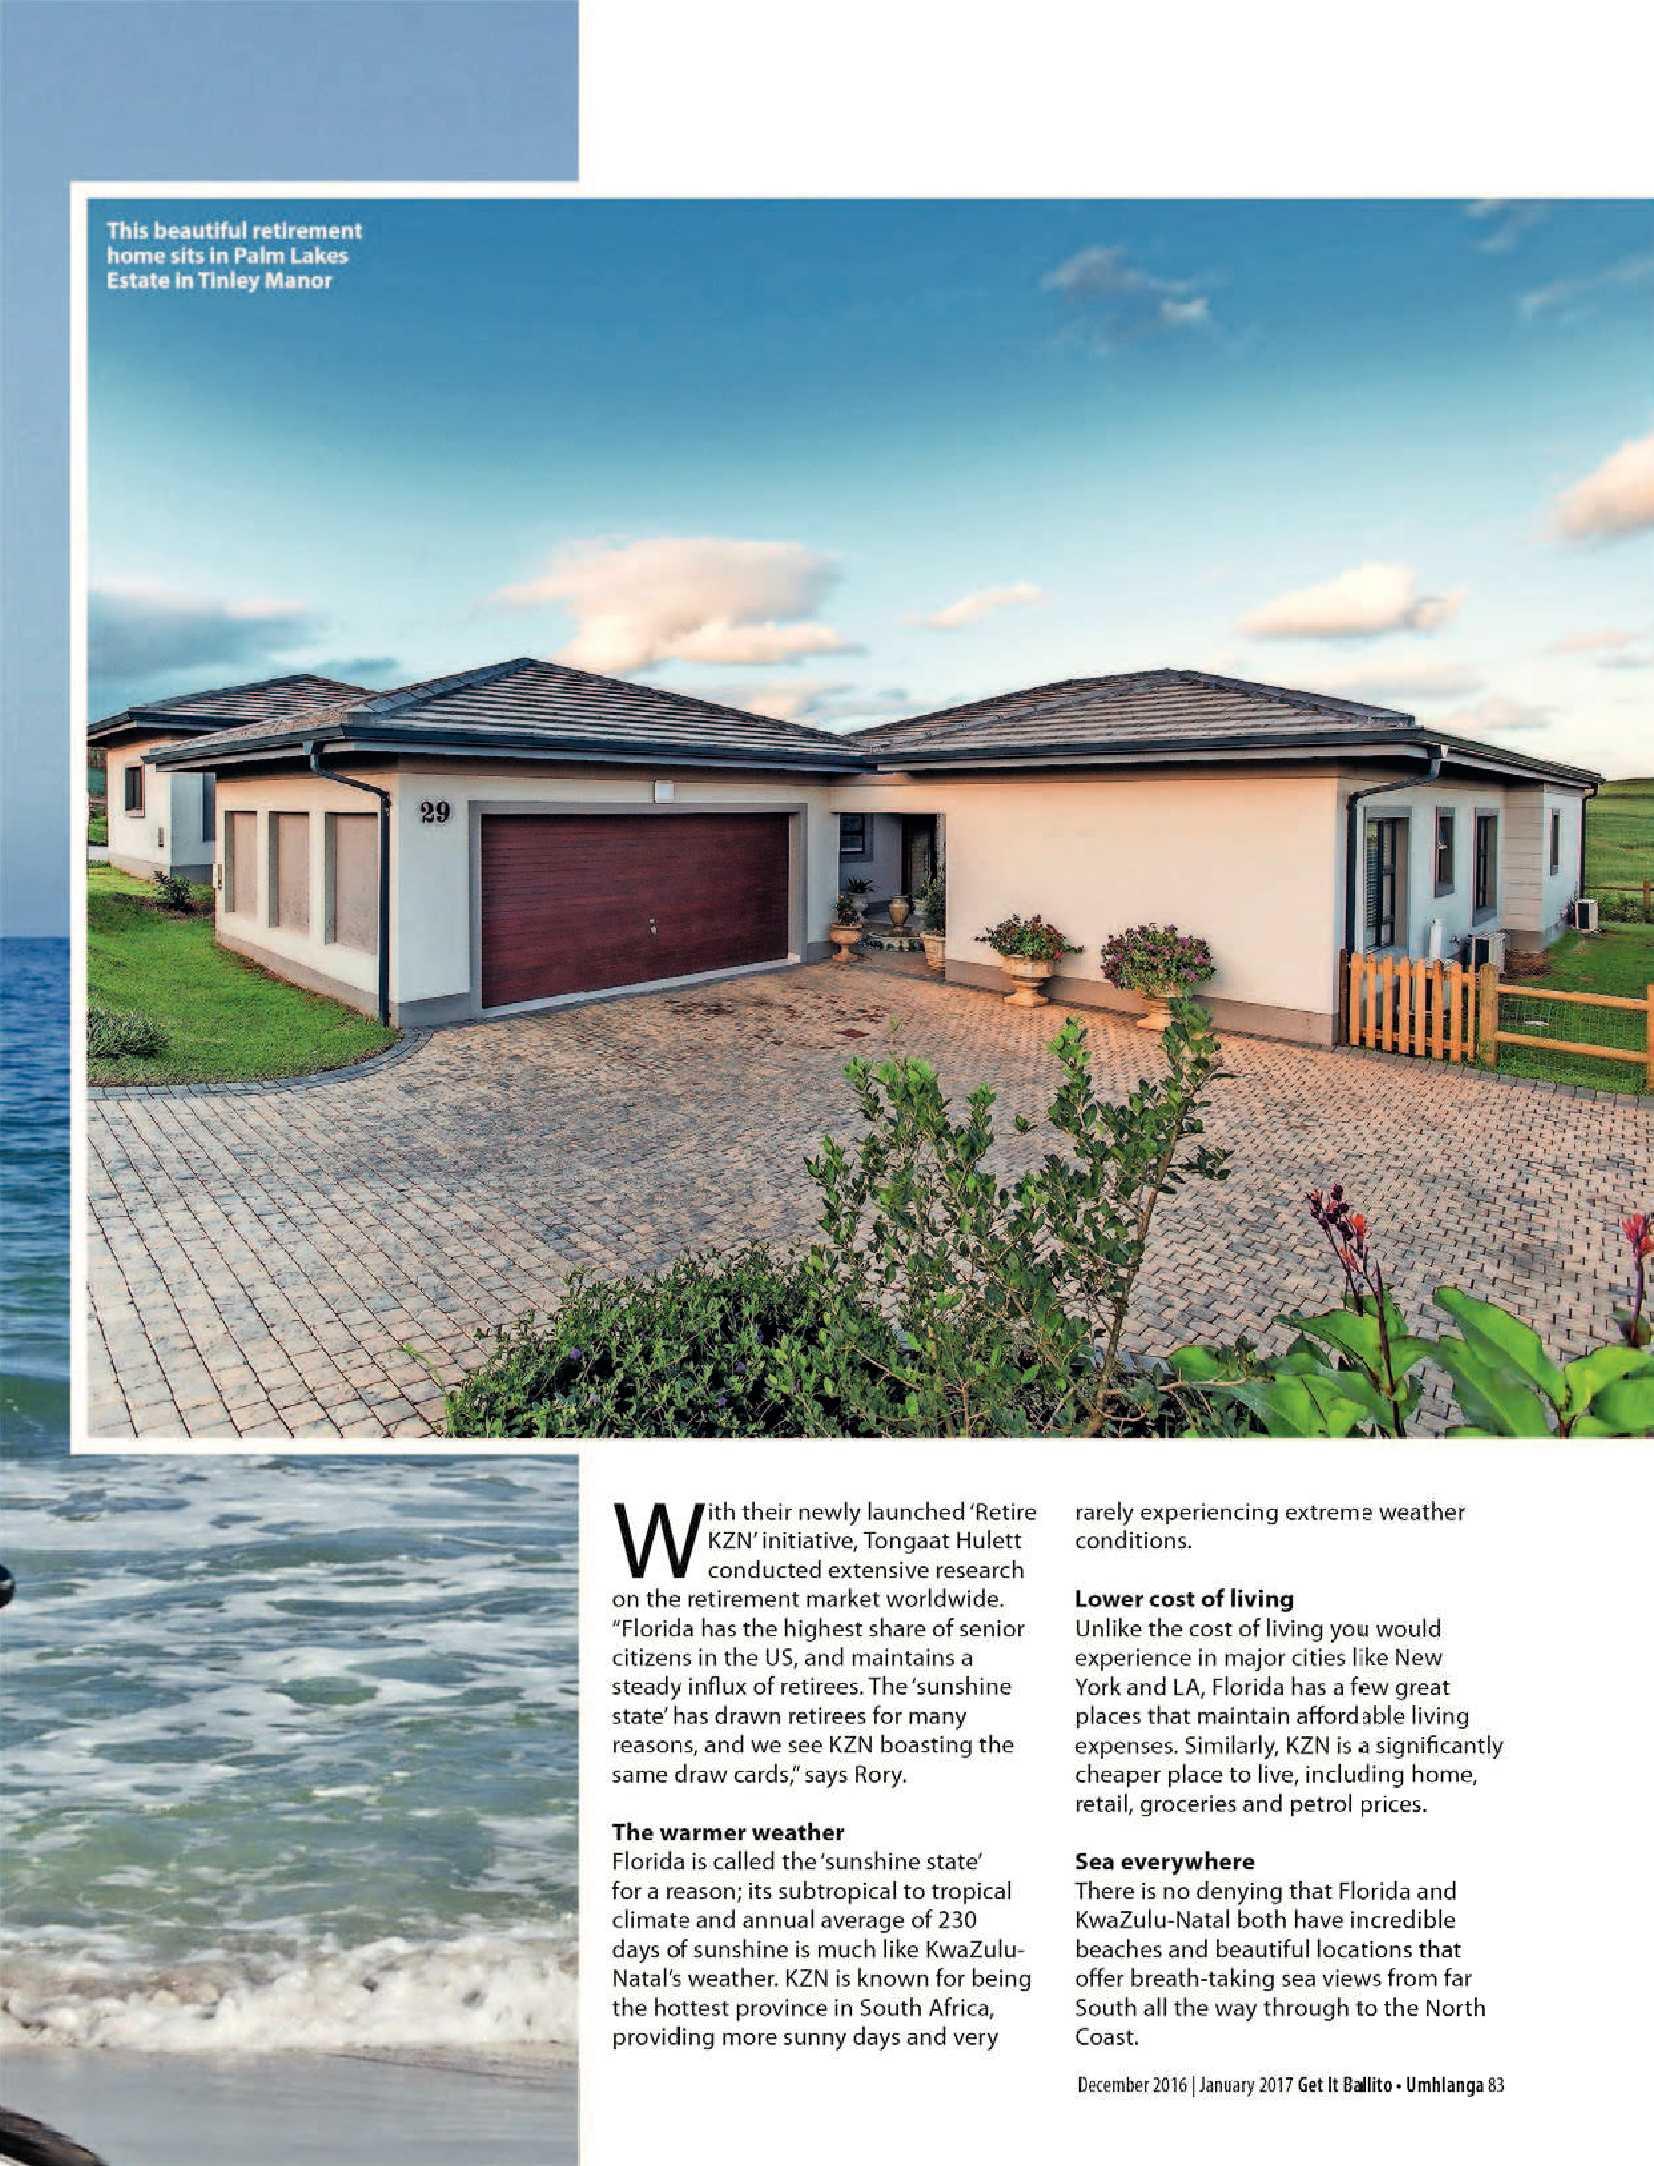 get-magazine-ballitoumhlanga-december-2016-january-2017-epapers-page-85